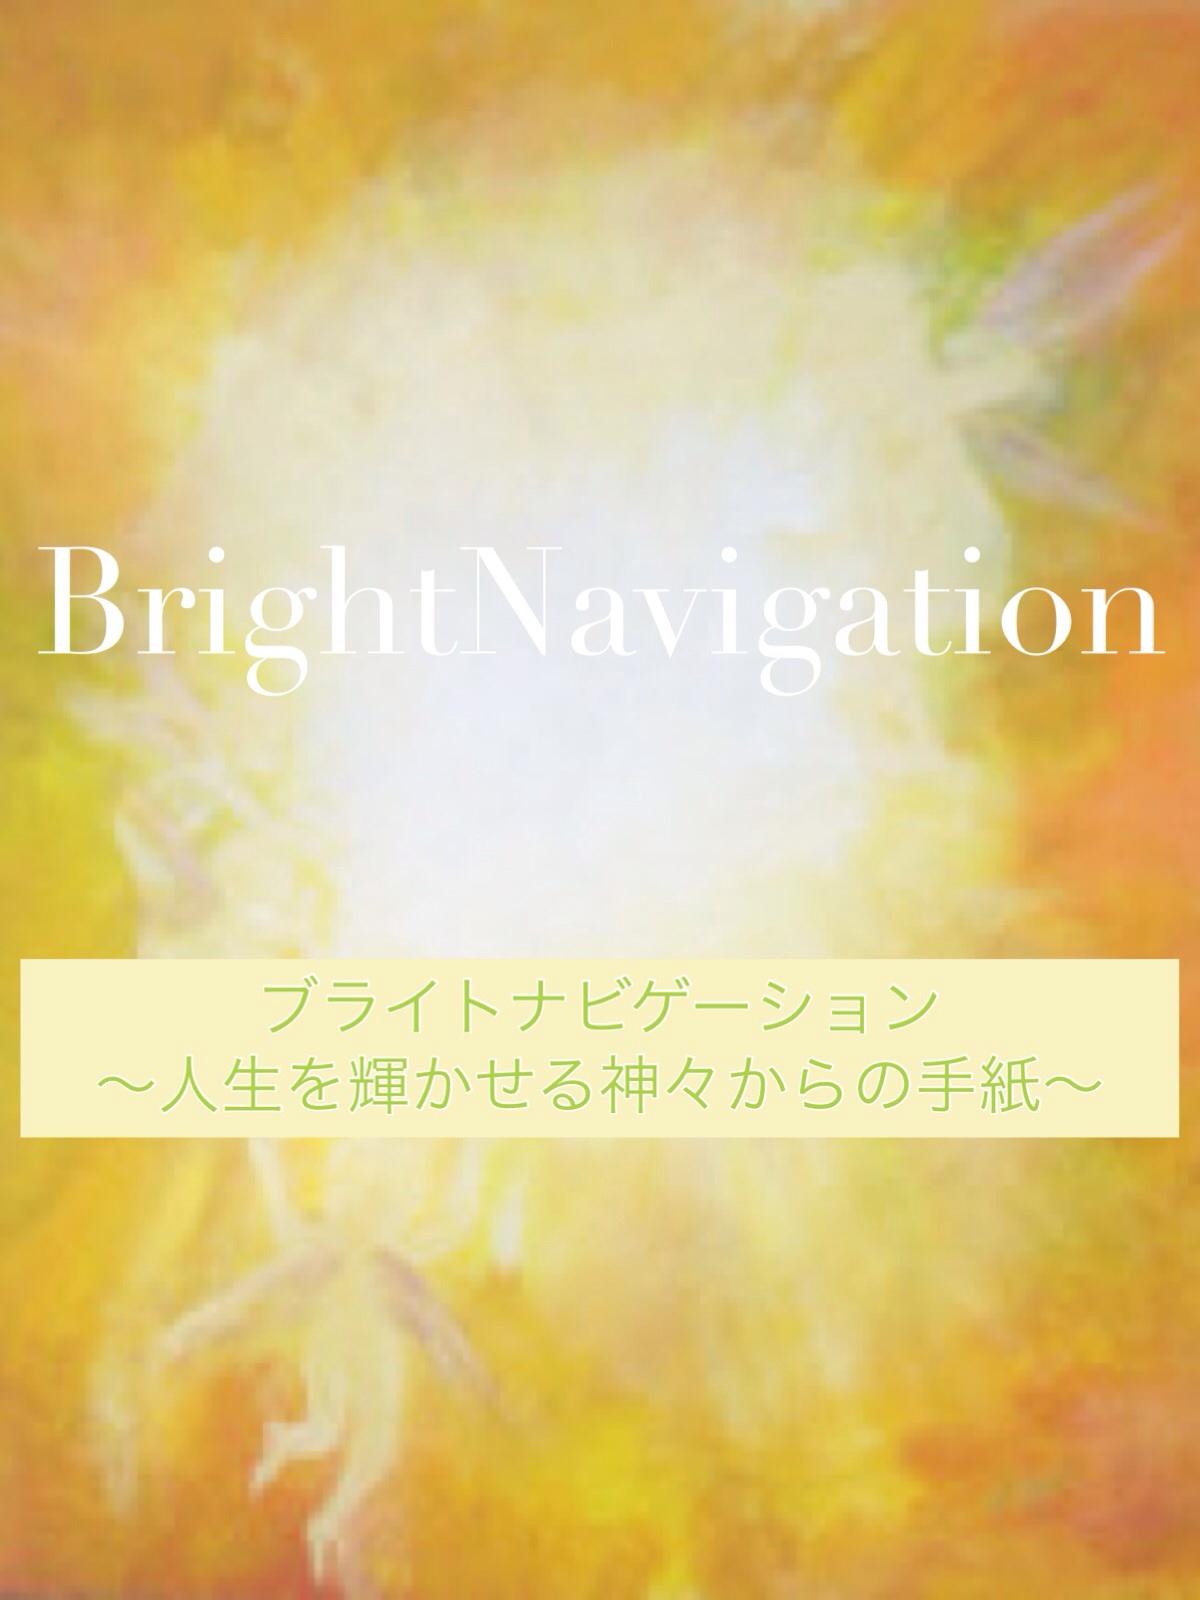 BrightNavigation藤田 ひとみ